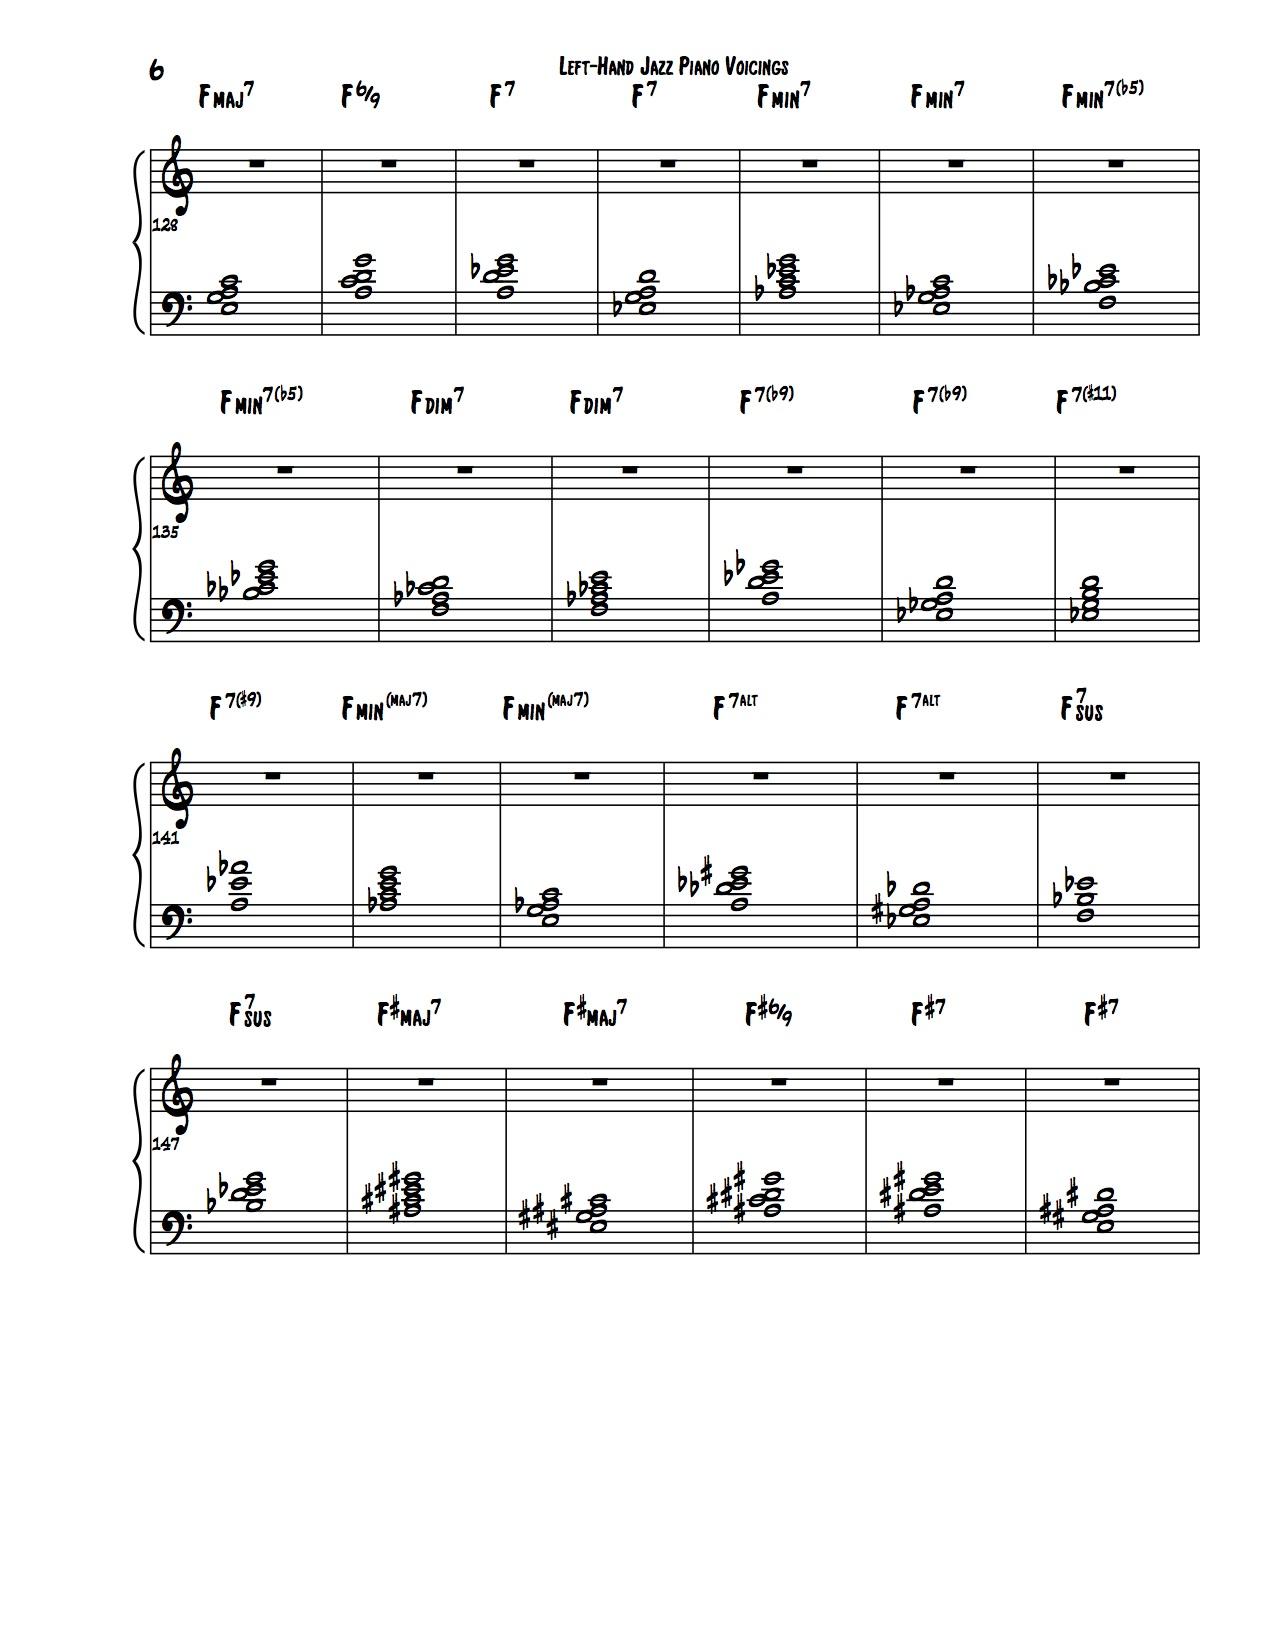 Encyclopedia of left hand jazz piano voicings learn jazz standards encyclopedia of left hand voicings 6 biocorpaavc Choice Image